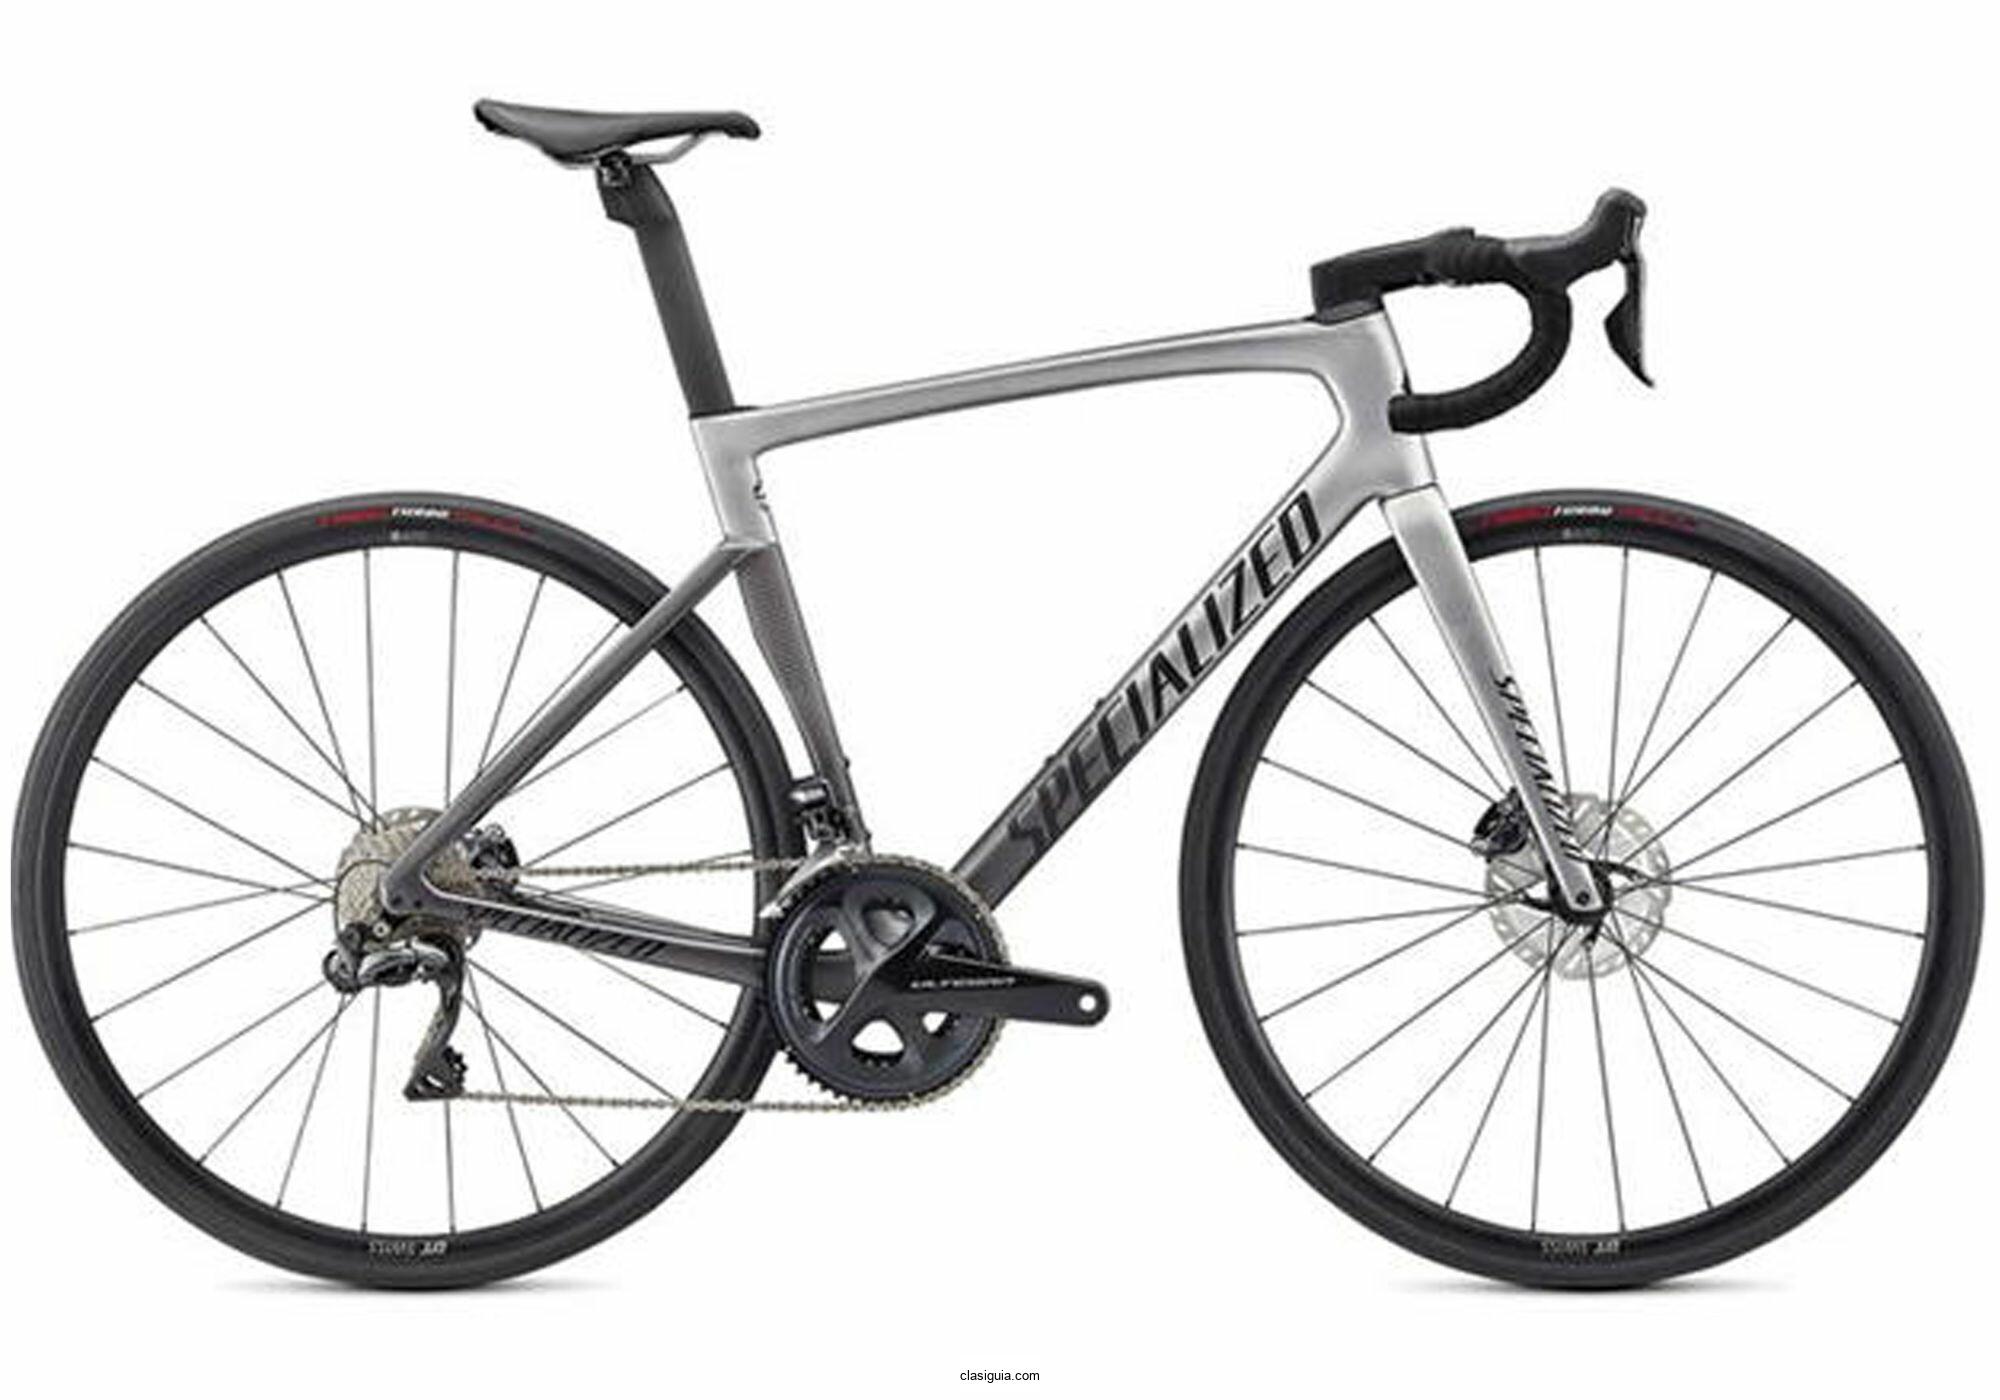 2021 - Specialized Road Bike Tarmac SL7 Expert Di2 (RUNCYCLES)